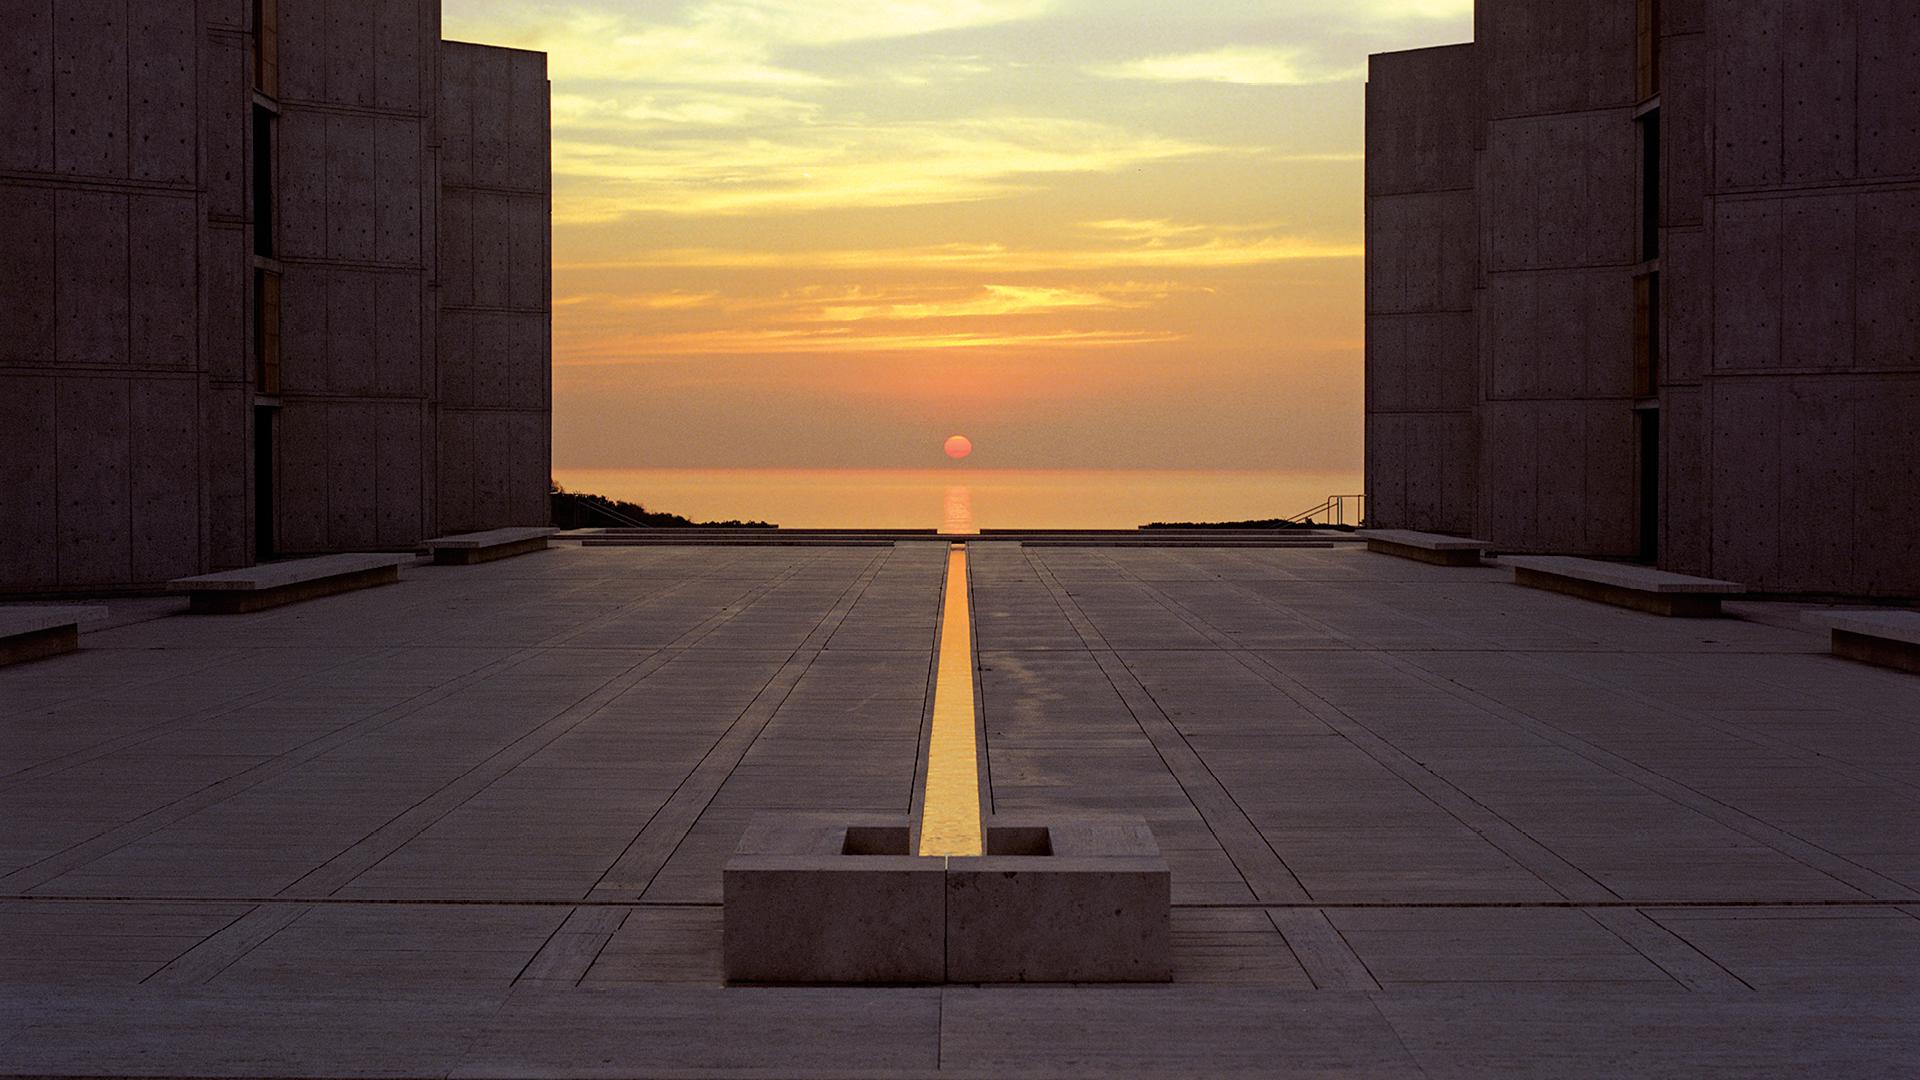 The Salk Institute for Biological Studies in San Diego, designed by Louis Kahn| The Silence Rings Loud | Louis Kahn| Sanjeev Panjabi | STIRworld